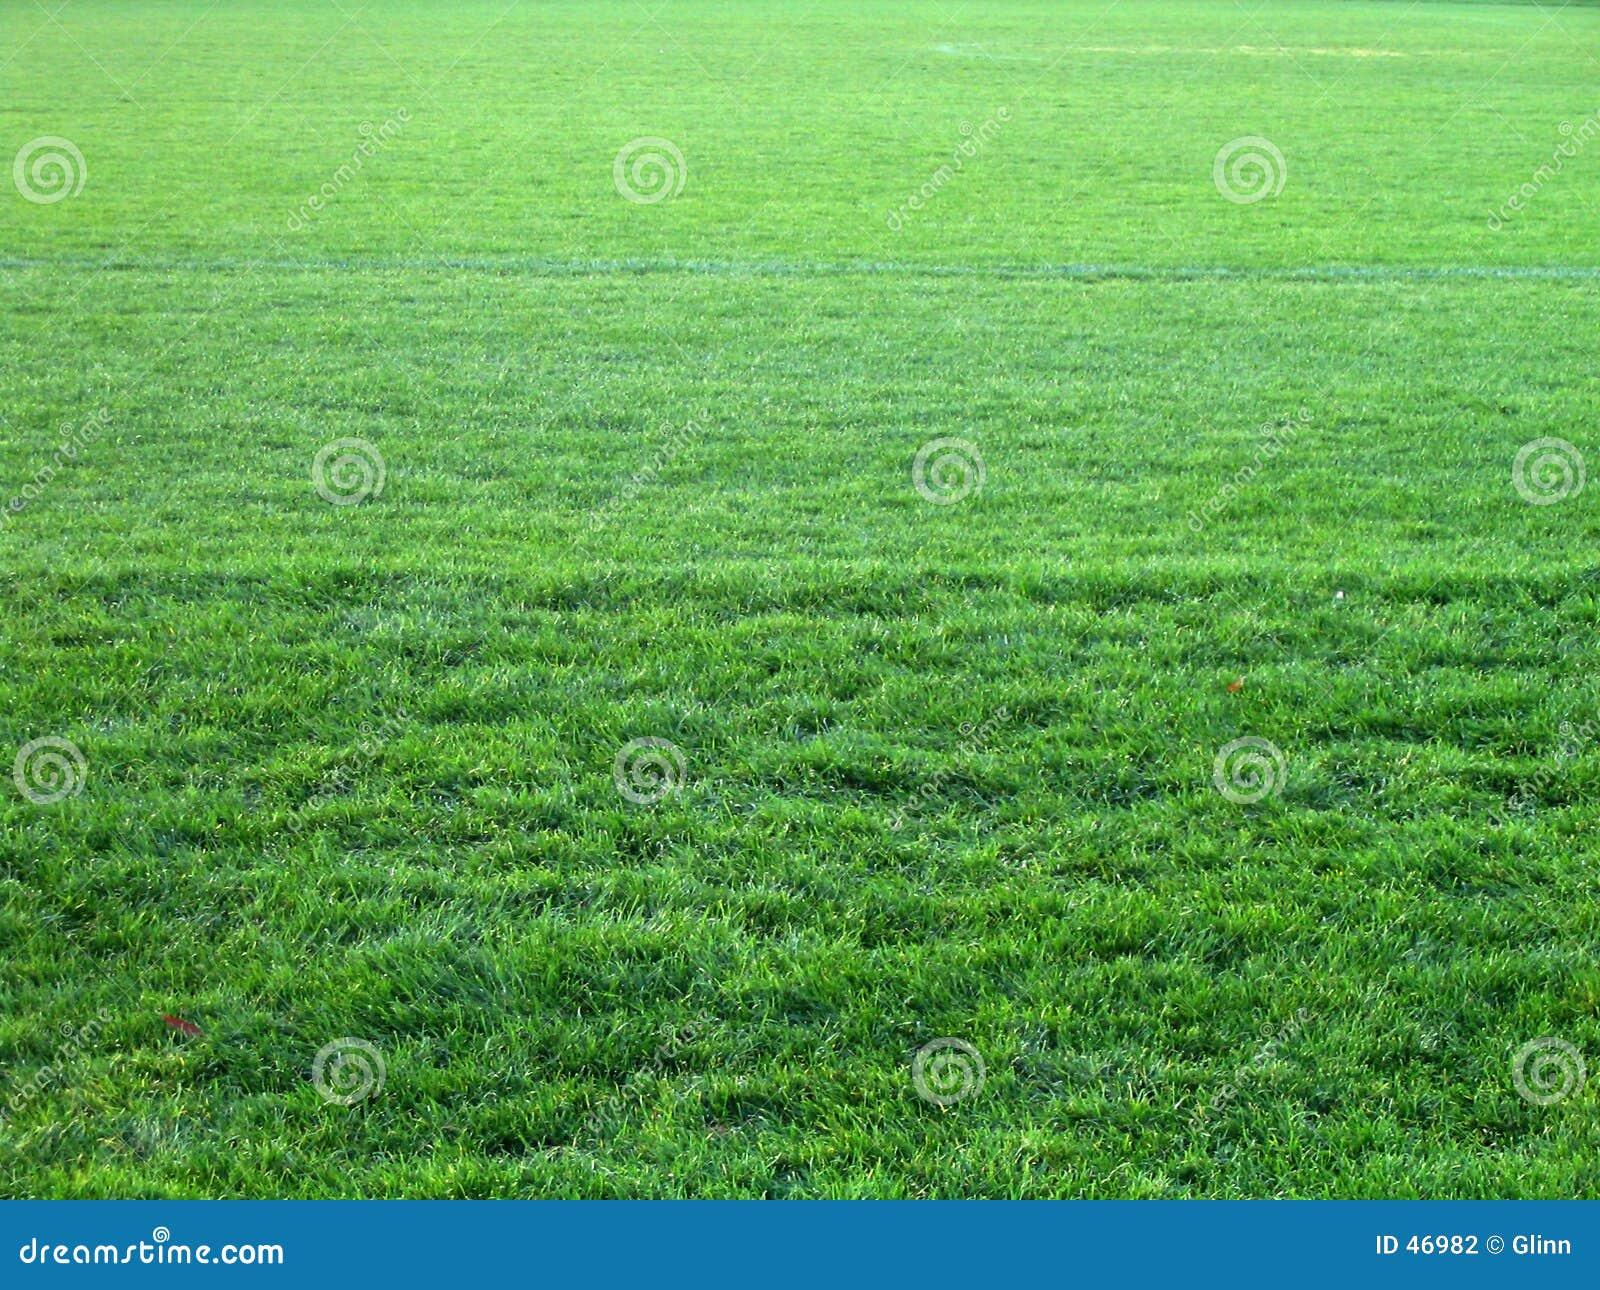 Alles grüne Gras